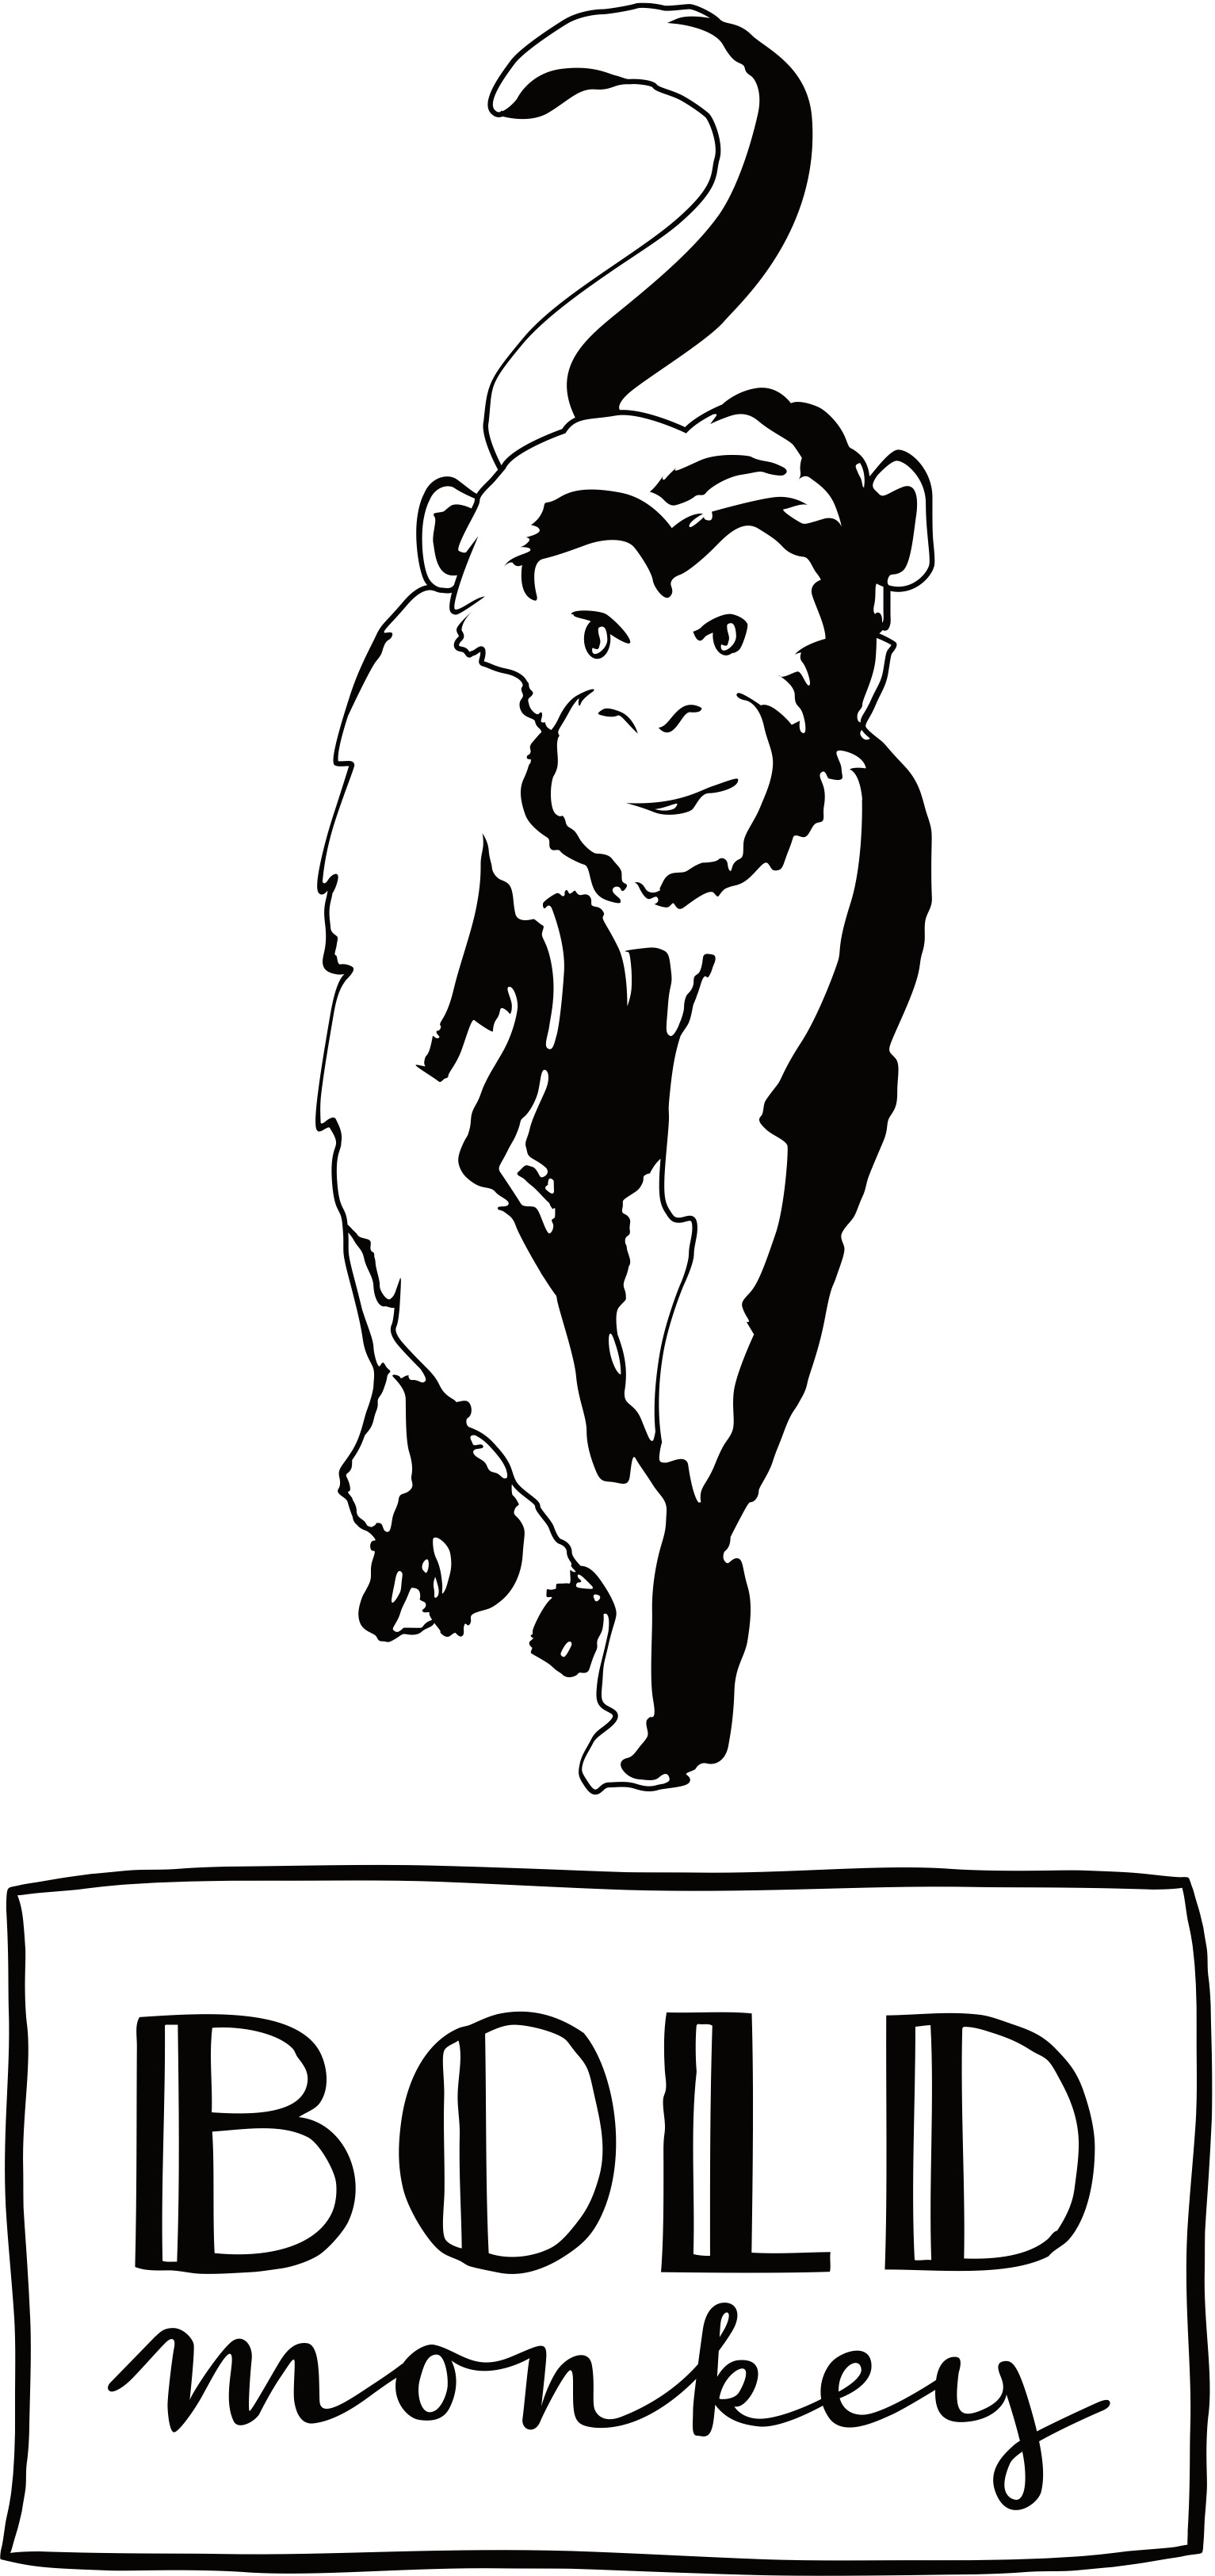 Bold Monkey lazy daydreamer zilver zwart daybed divan pauwpatroon gouden poten zijaanzicht